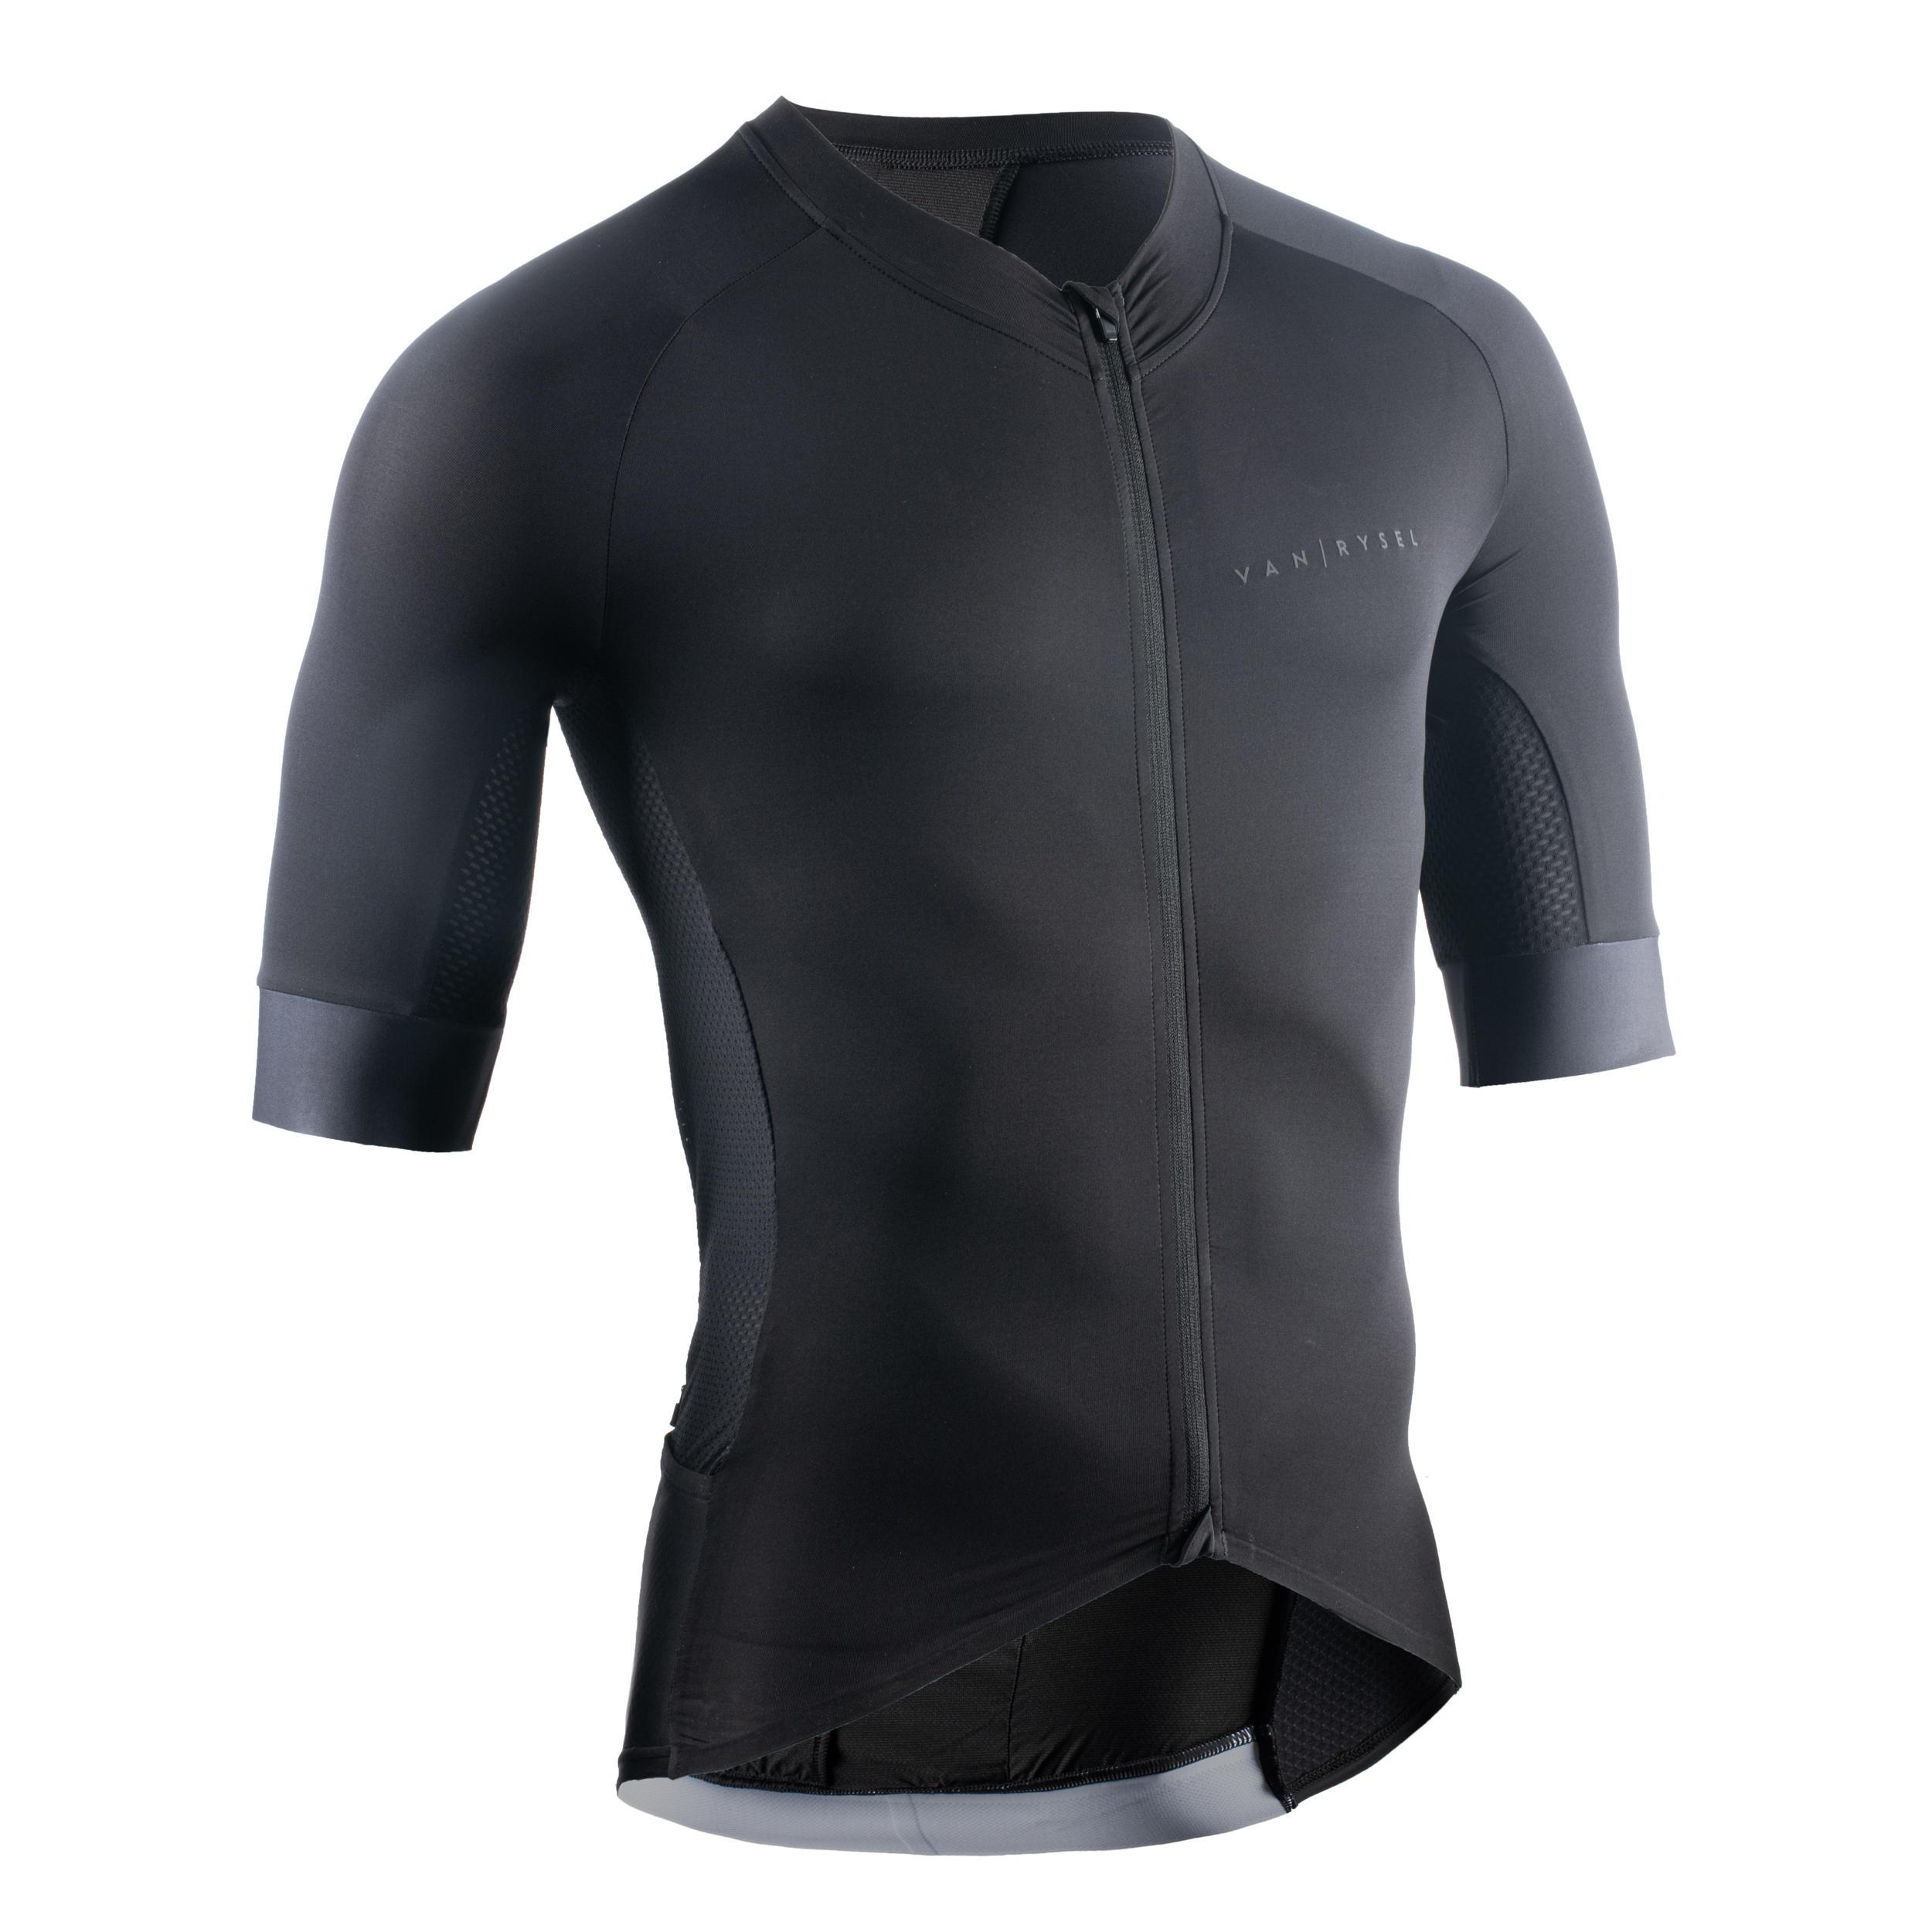 Tricou ciclism Racer Bărbați imagine produs